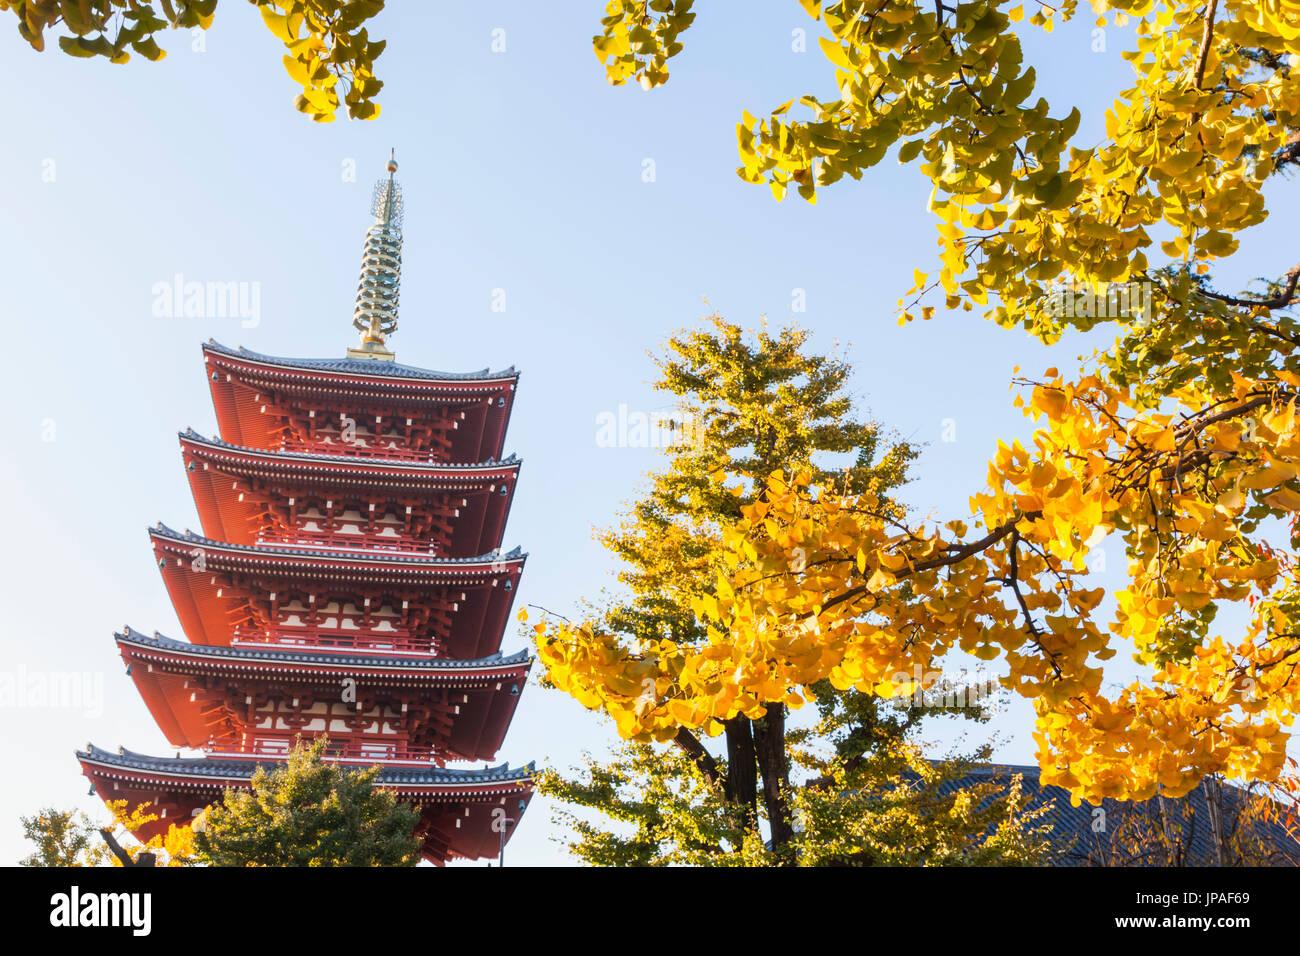 11 Things To Do in Asakusa - Japan Talk